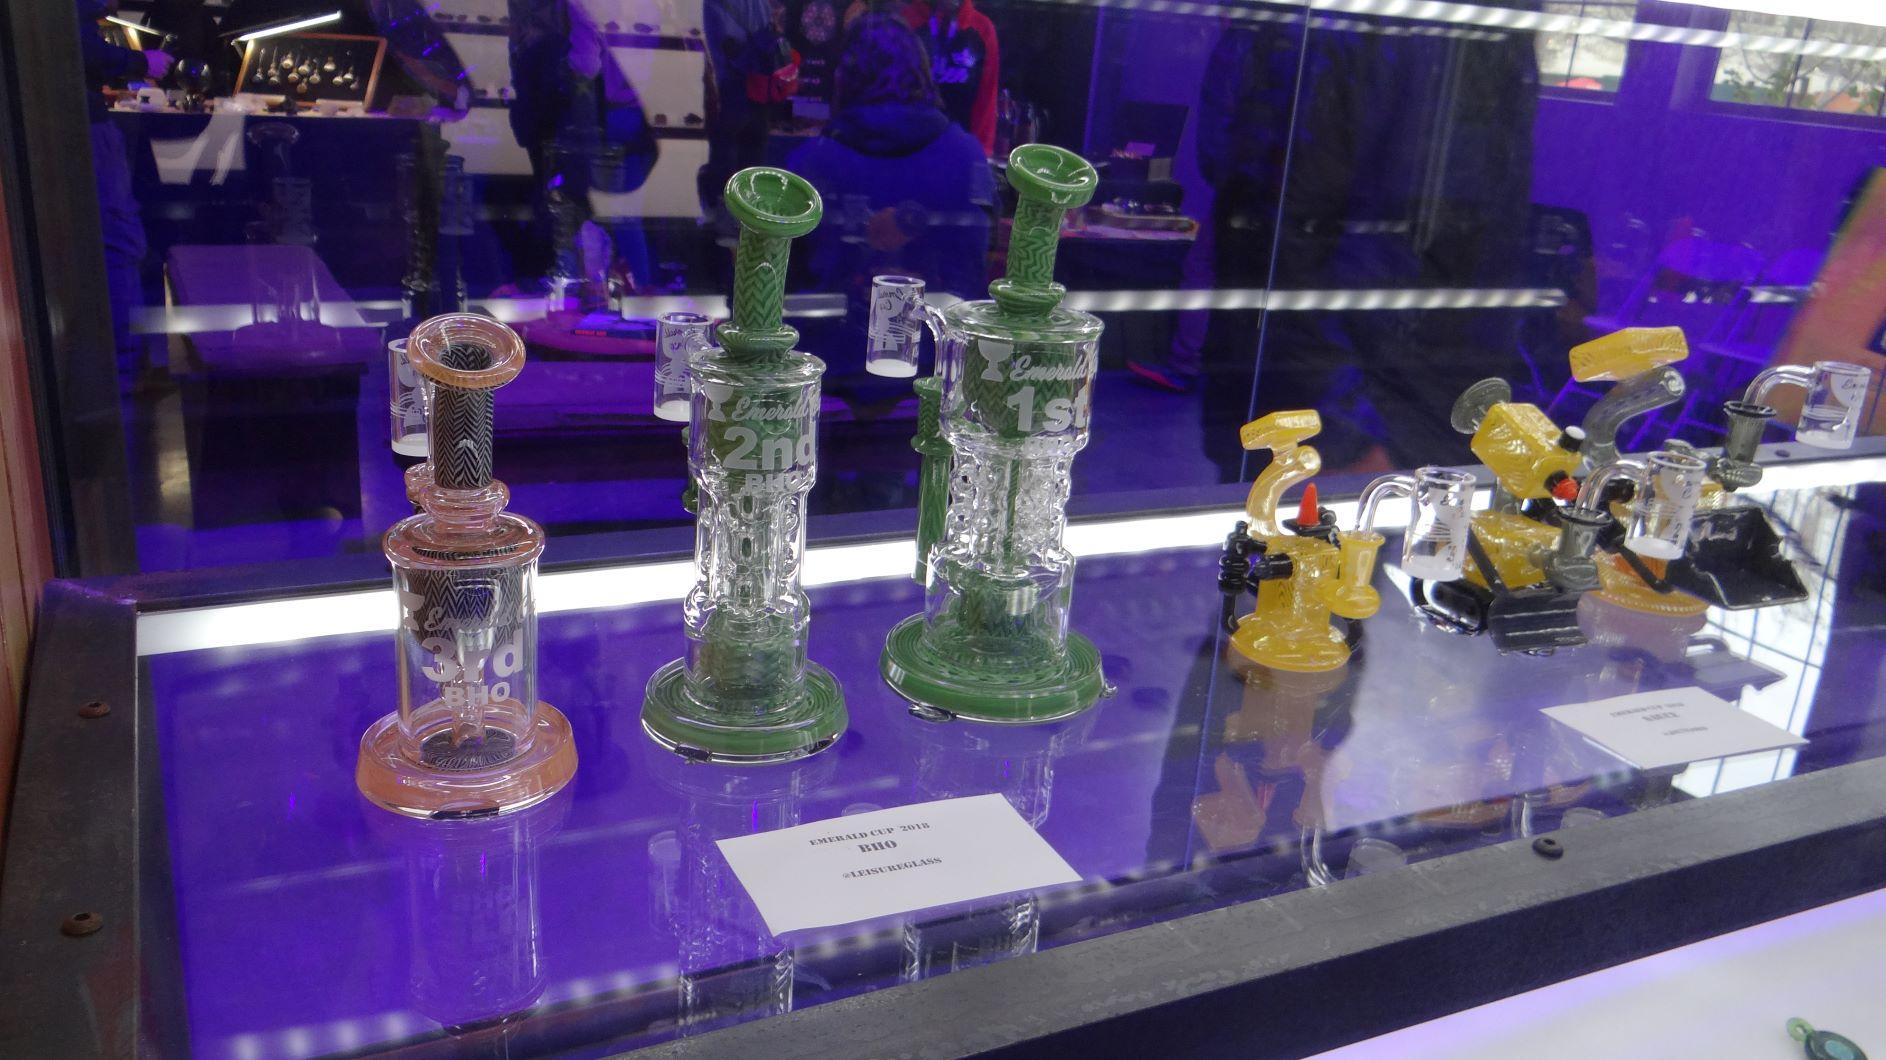 Emerald Cup Awards